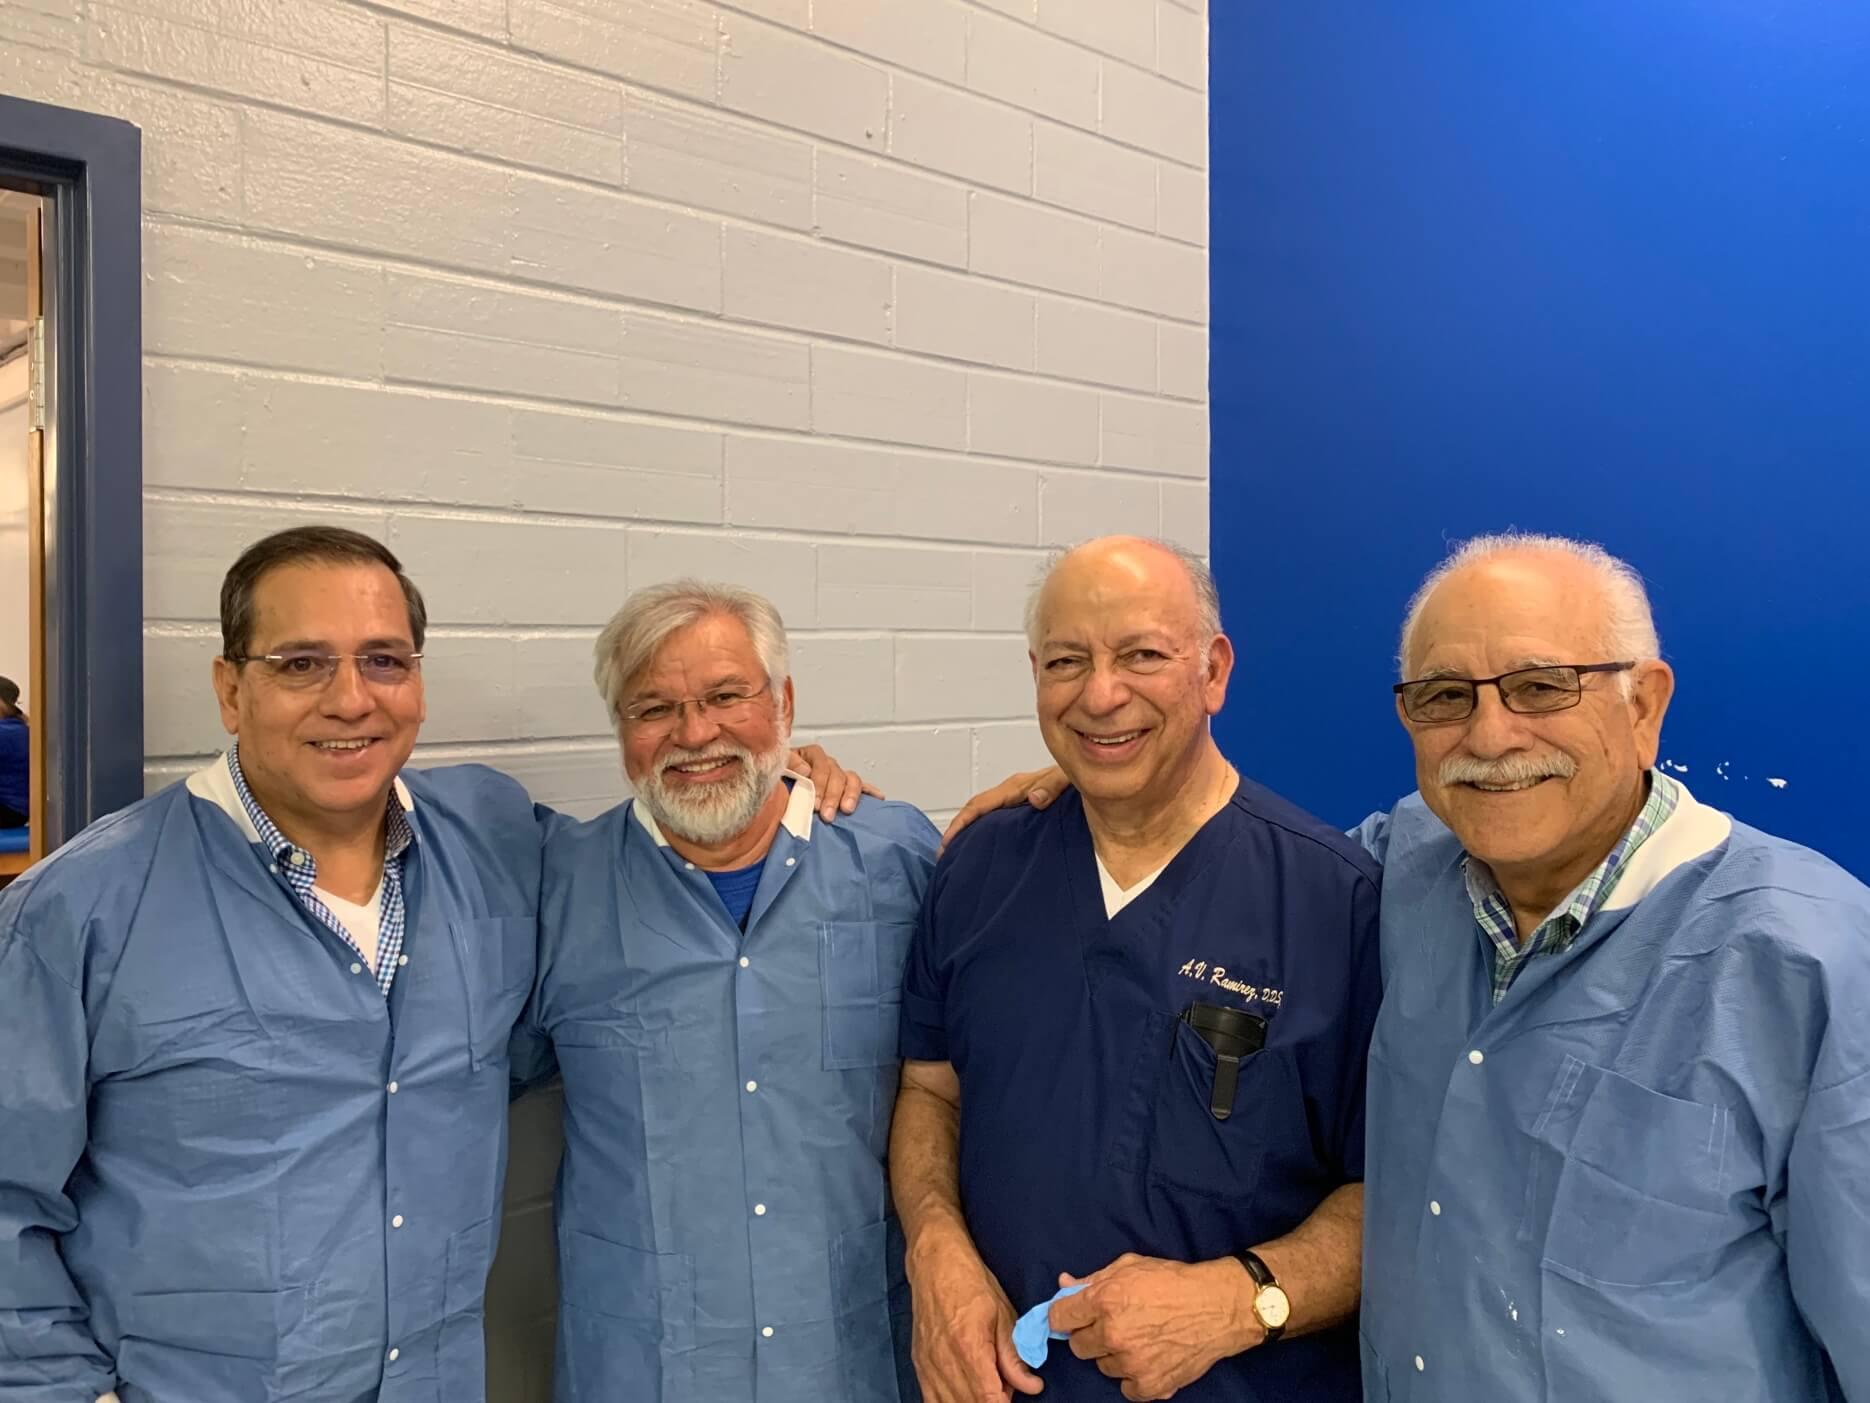 Dr Campos Dr Joel GARZA Arturo Ramirez DDS Dr THOMAS Uribe.jpg